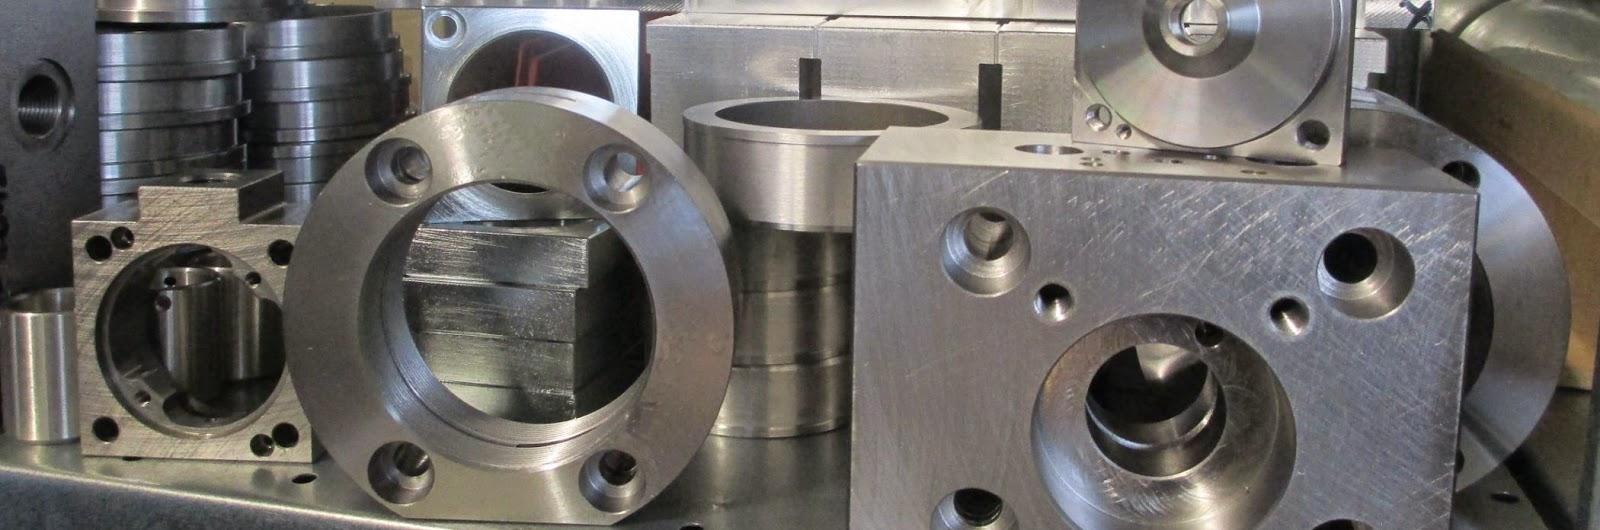 CNC Frästeile Prototypen